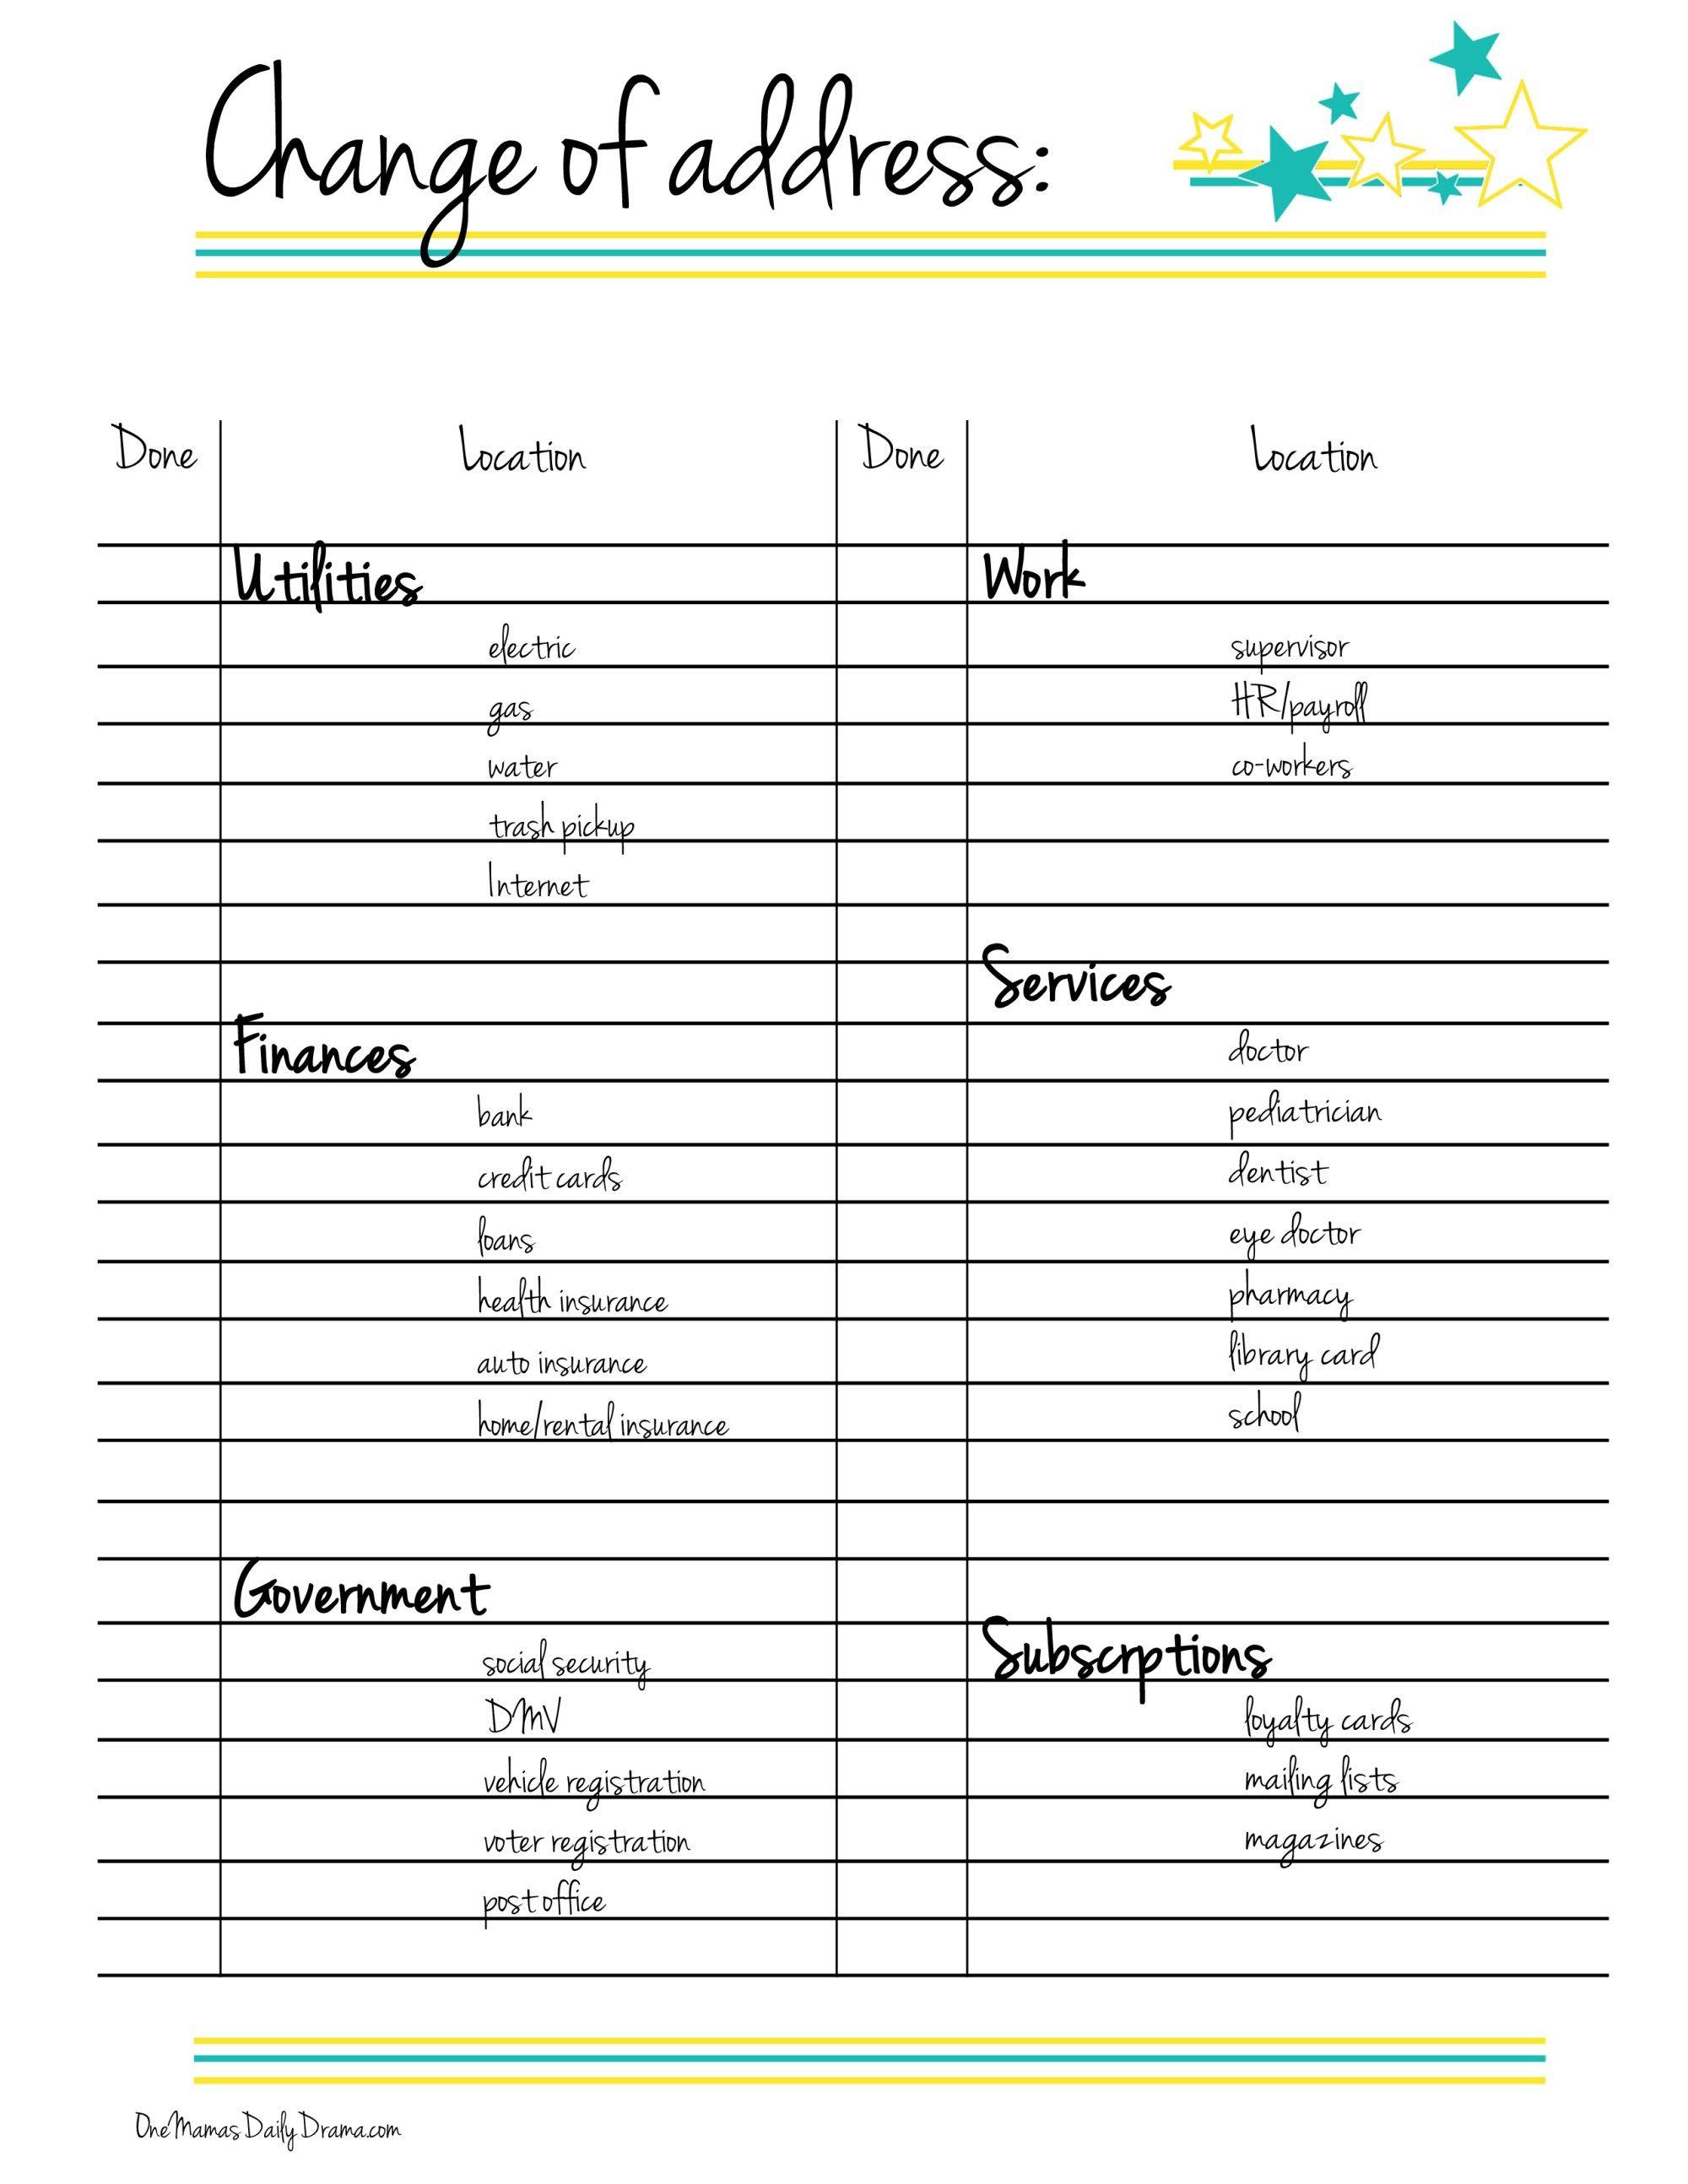 Printable Change Of Address Checklist Change Of Address Moving Checklist Moving Tips